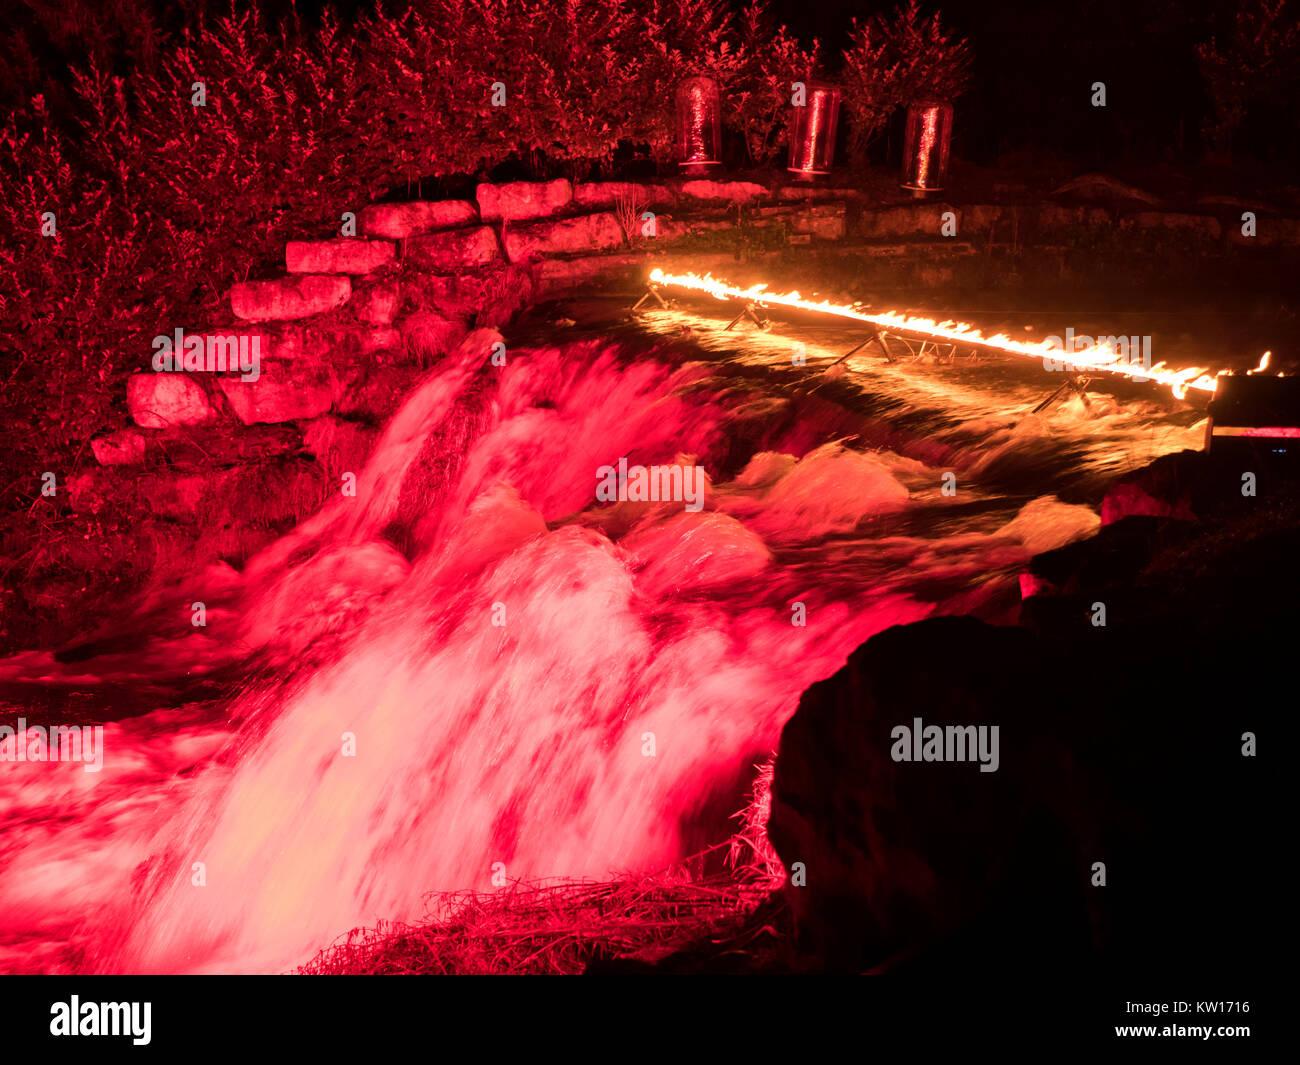 Blenheim Palace Christmas light trail 2017 - Stock Image